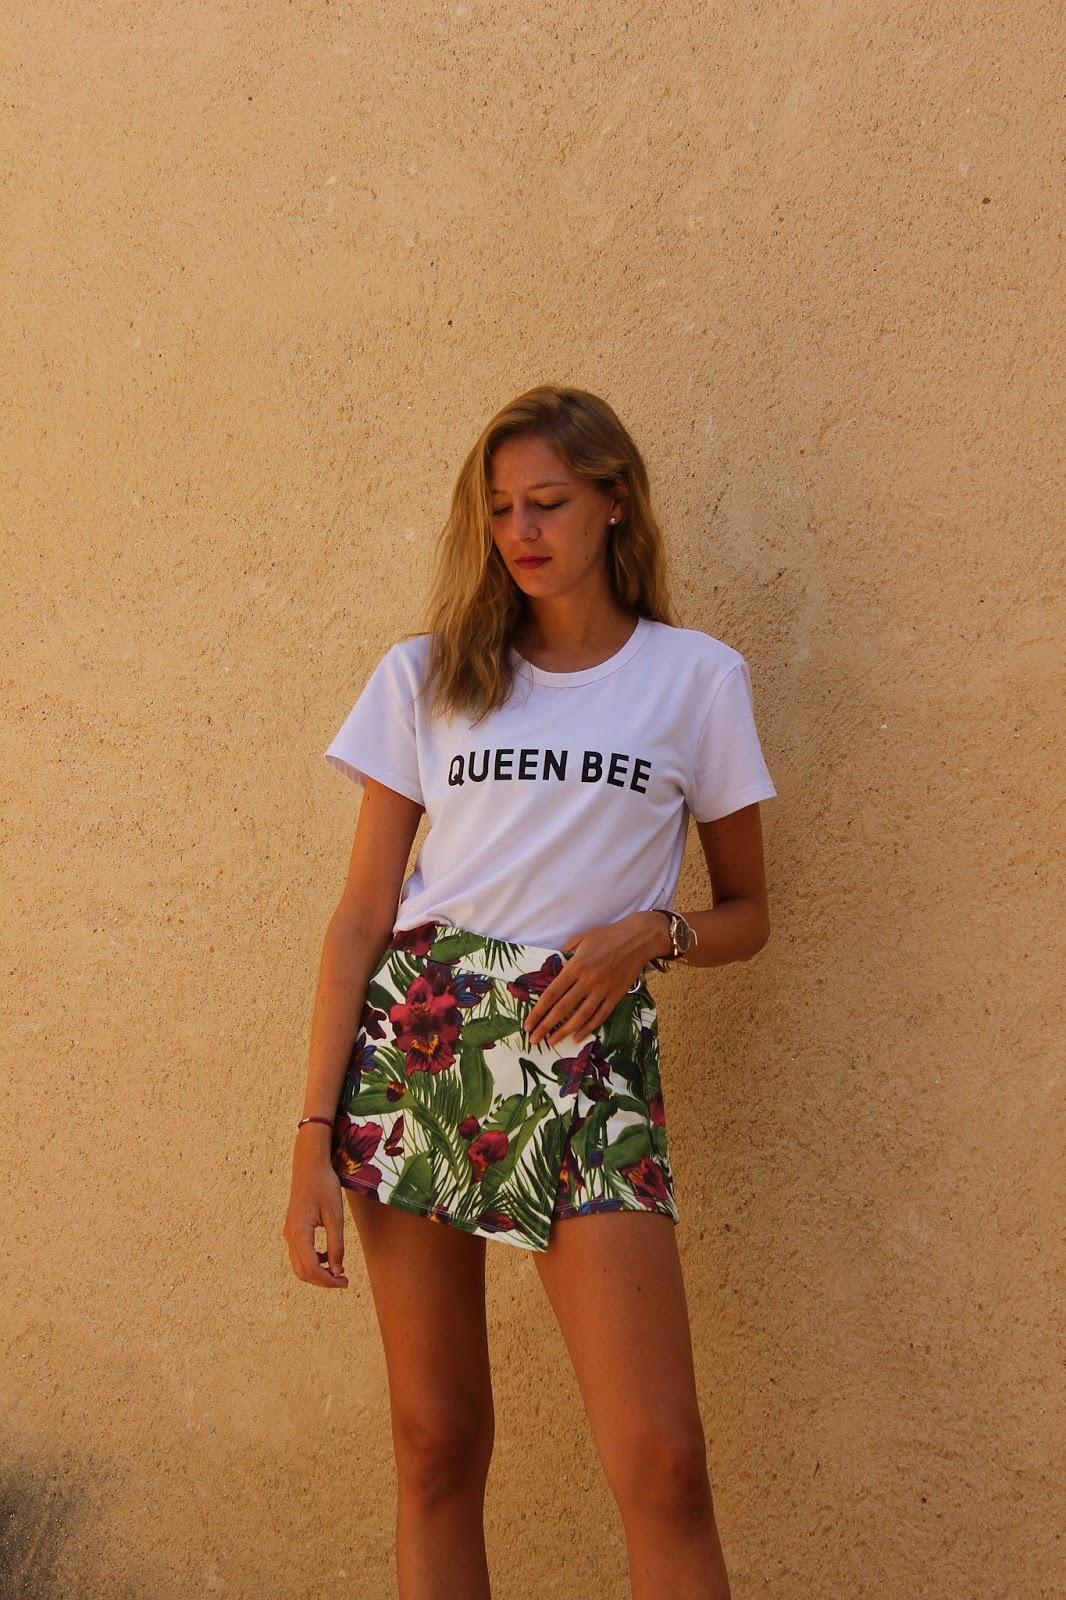 regina-george-mean-girls